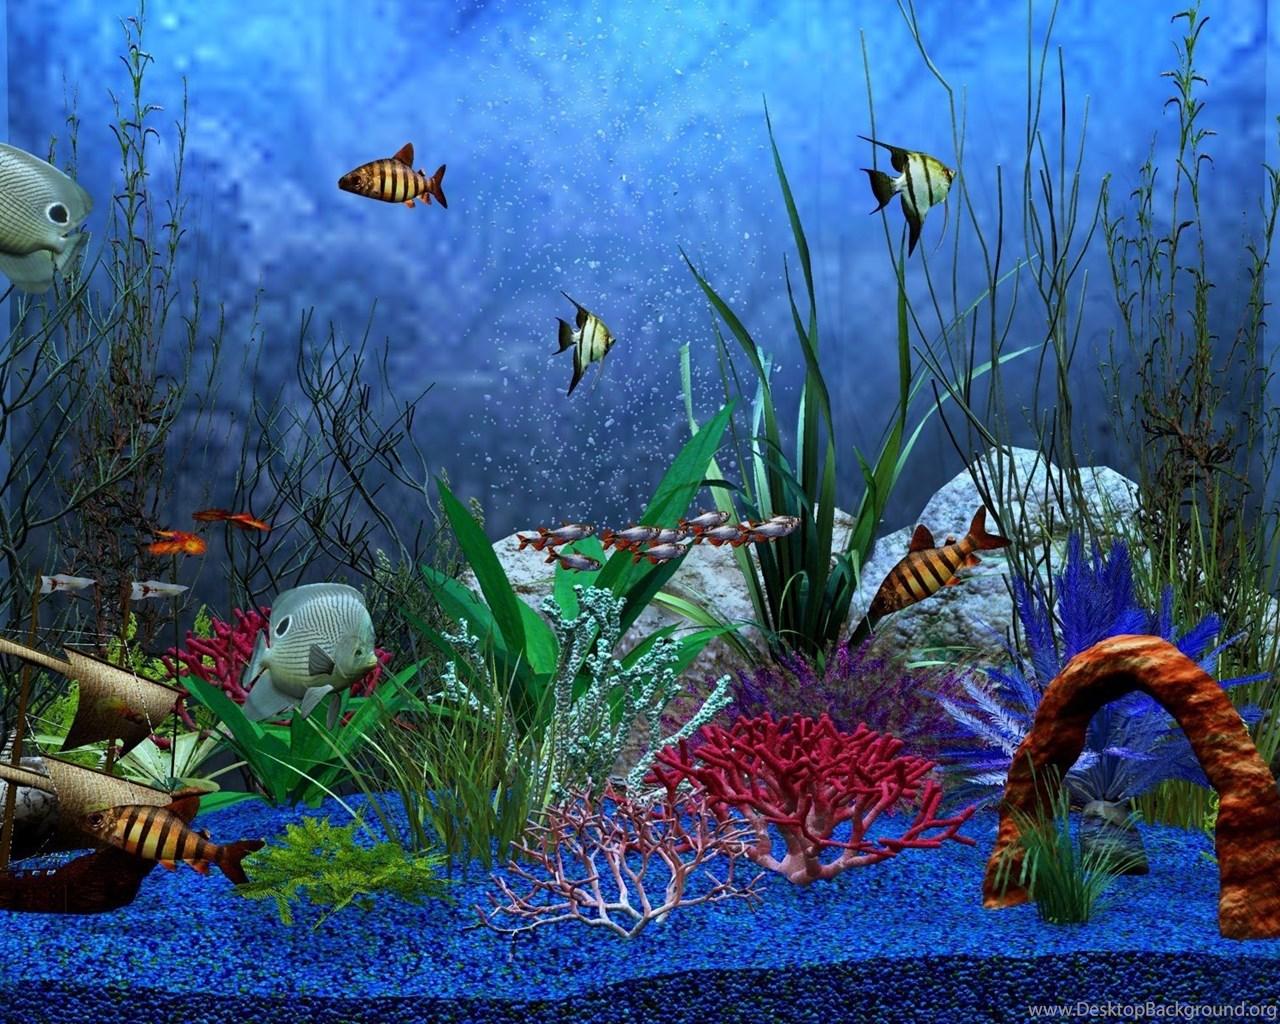 Download Every Iphone Live Wallpaper Live Fish Iphone: HD Aquarium Fish Tank Computer Wallpapers Full Size